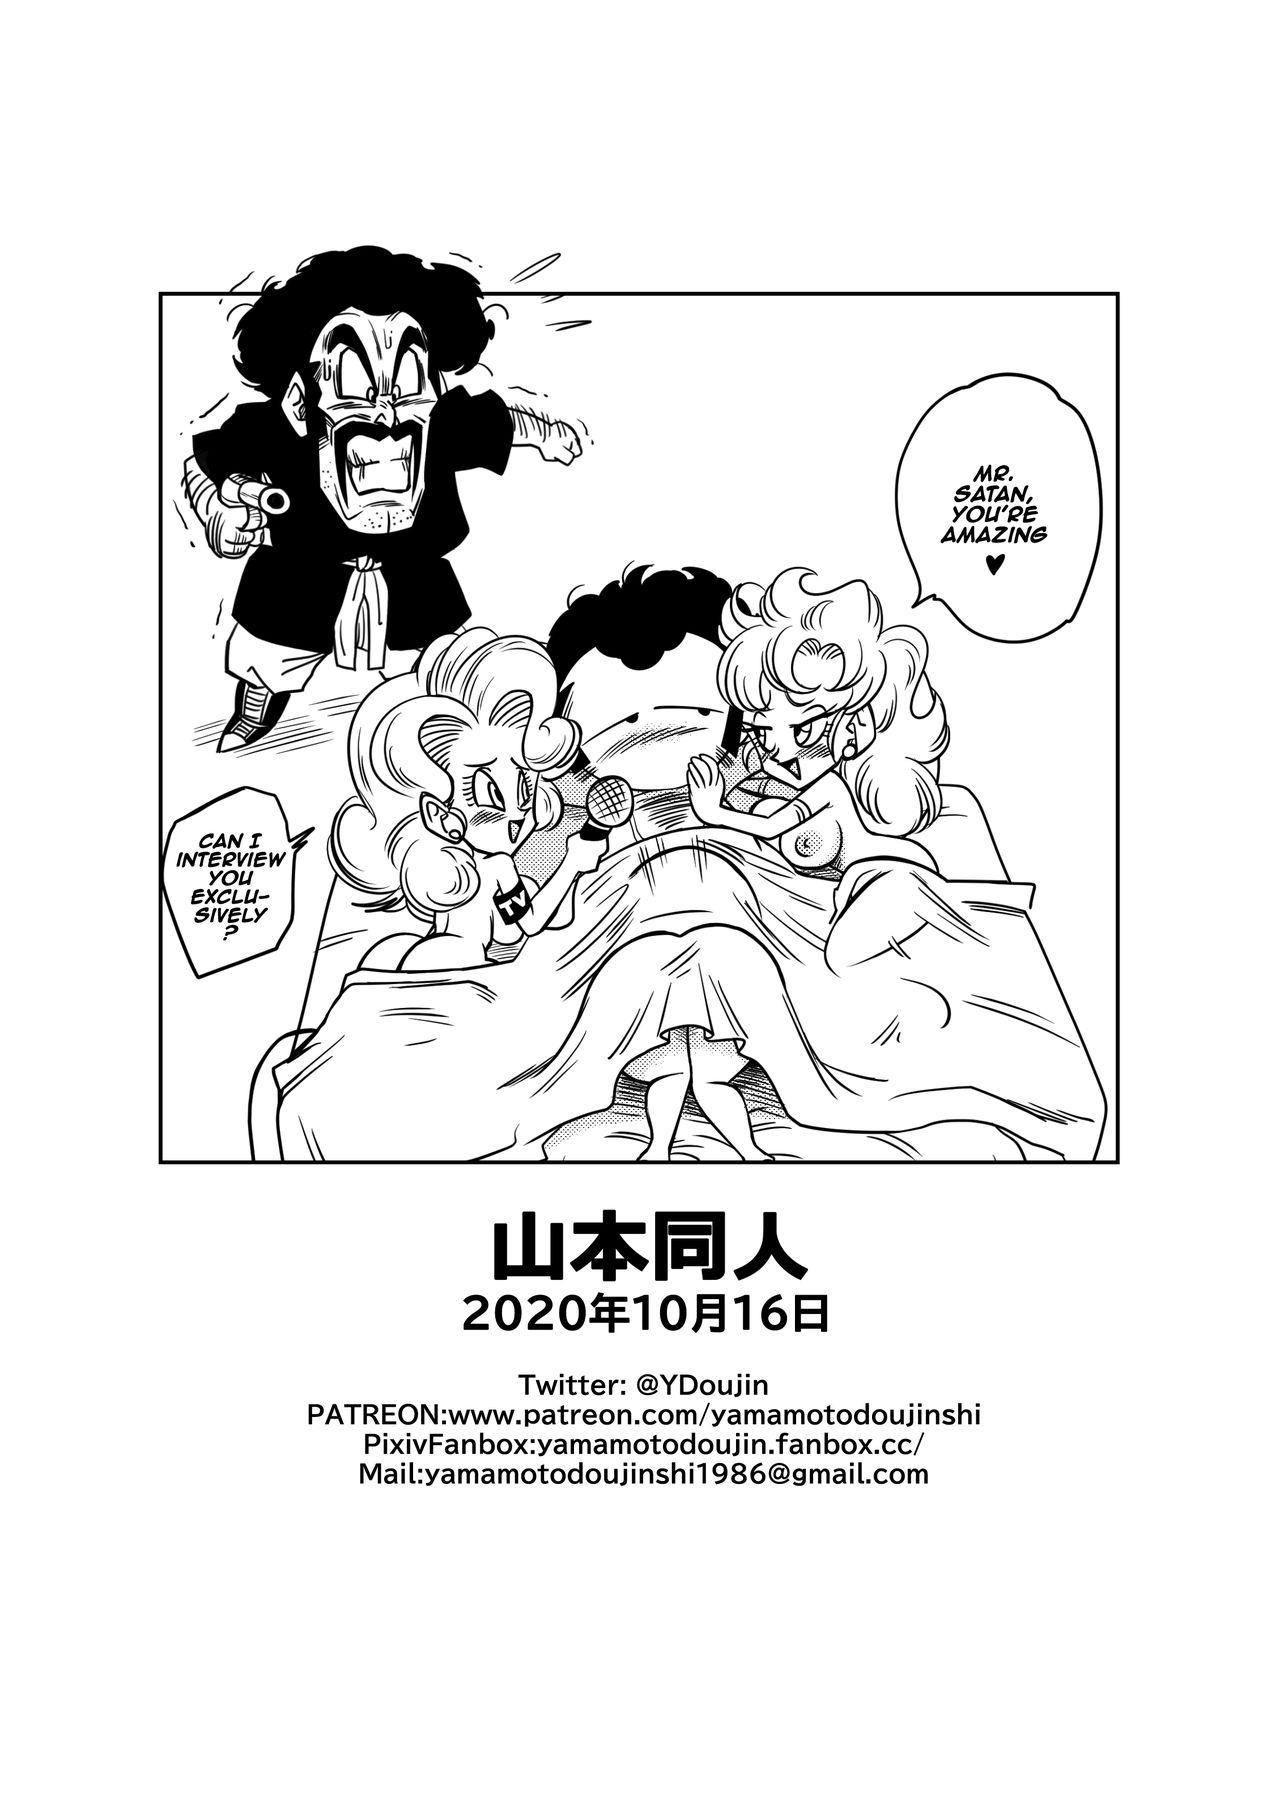 Mister Satan no Himitsu no Training | Mr. Satan's Secret Training 19